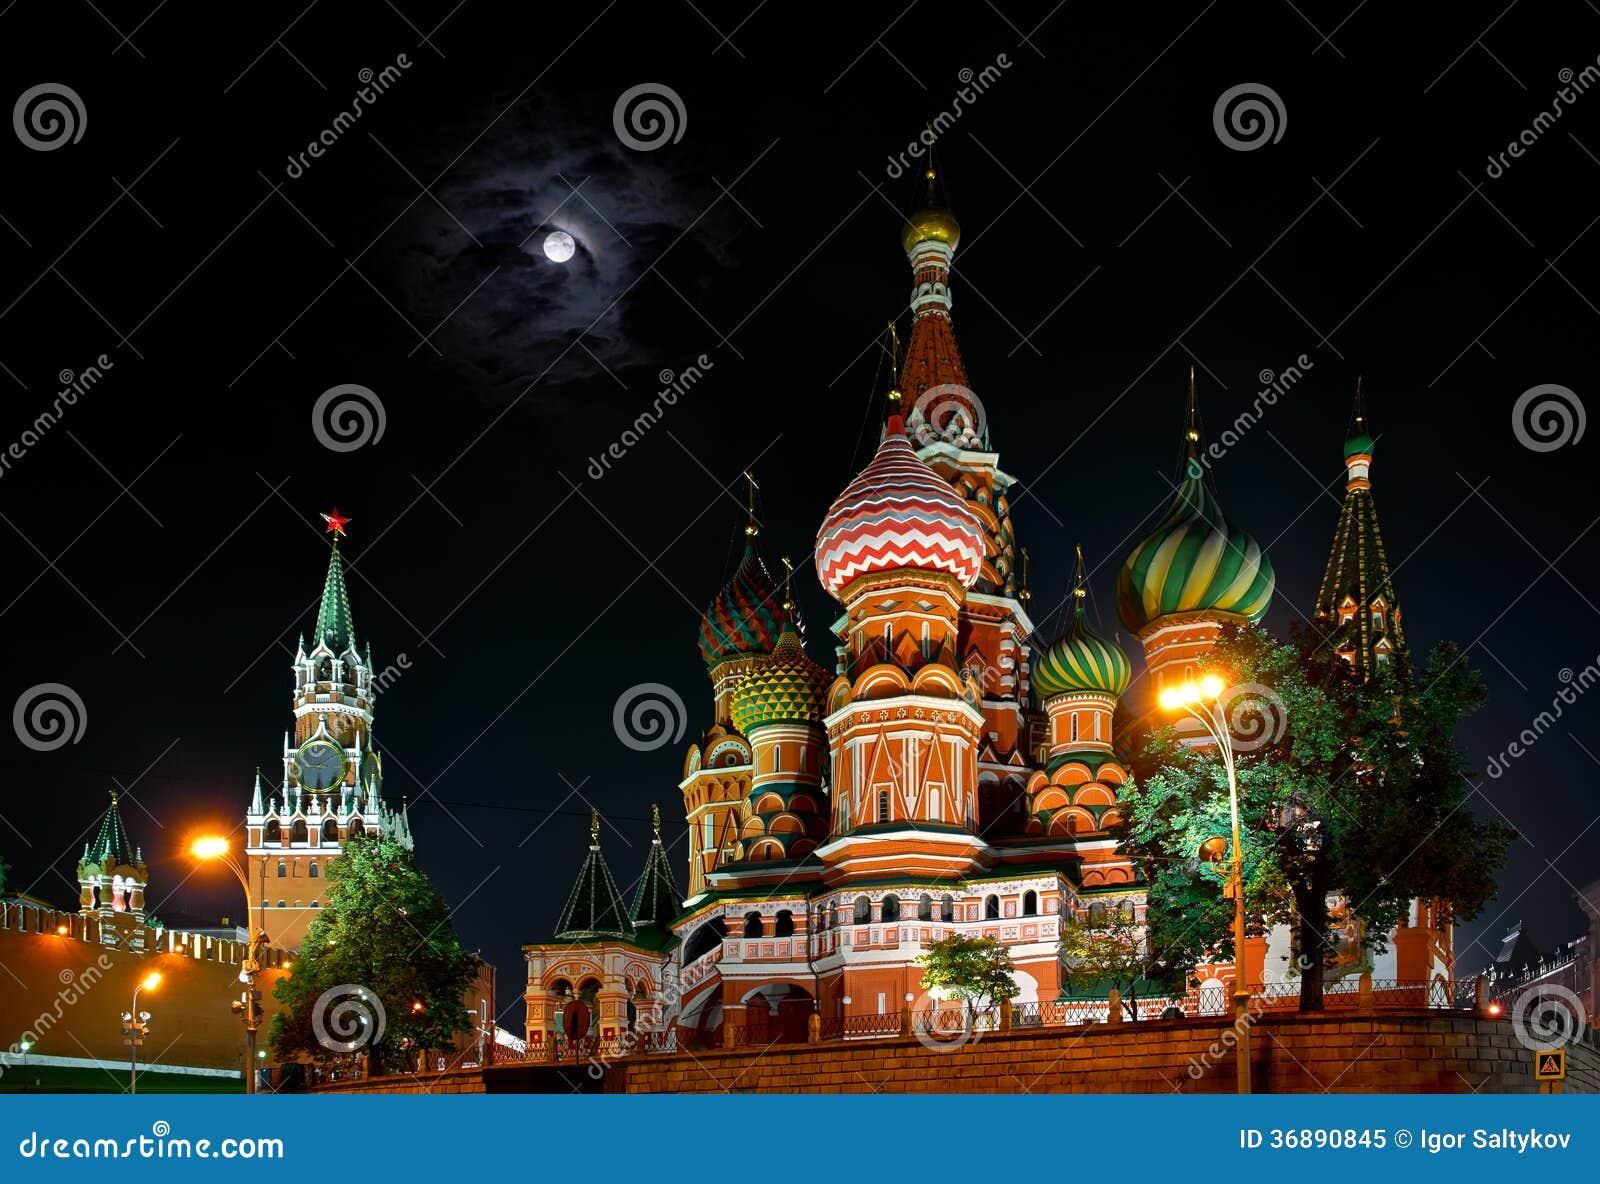 Download Cremlino di Mosca immagine stock. Immagine di firework - 36890845